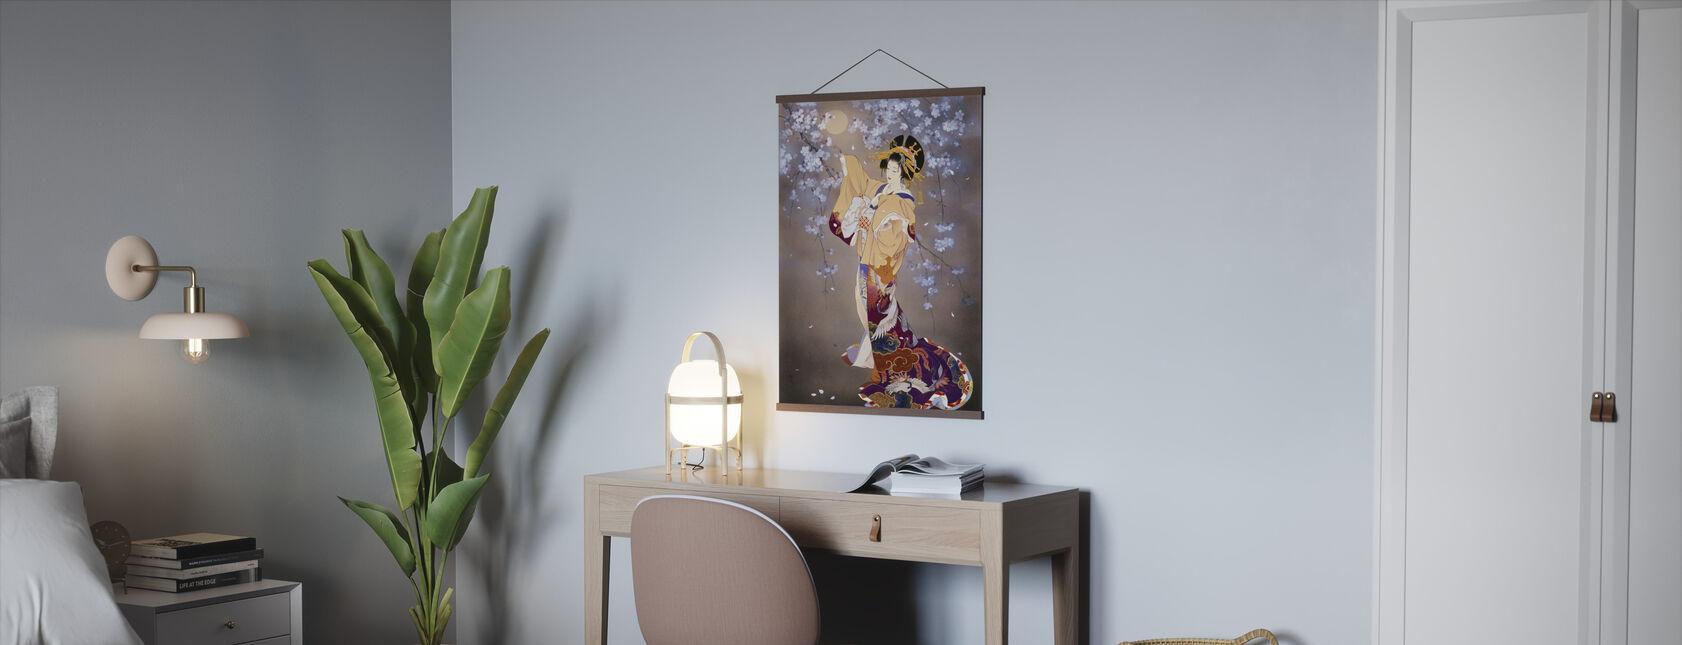 Yoi - Poster - Office